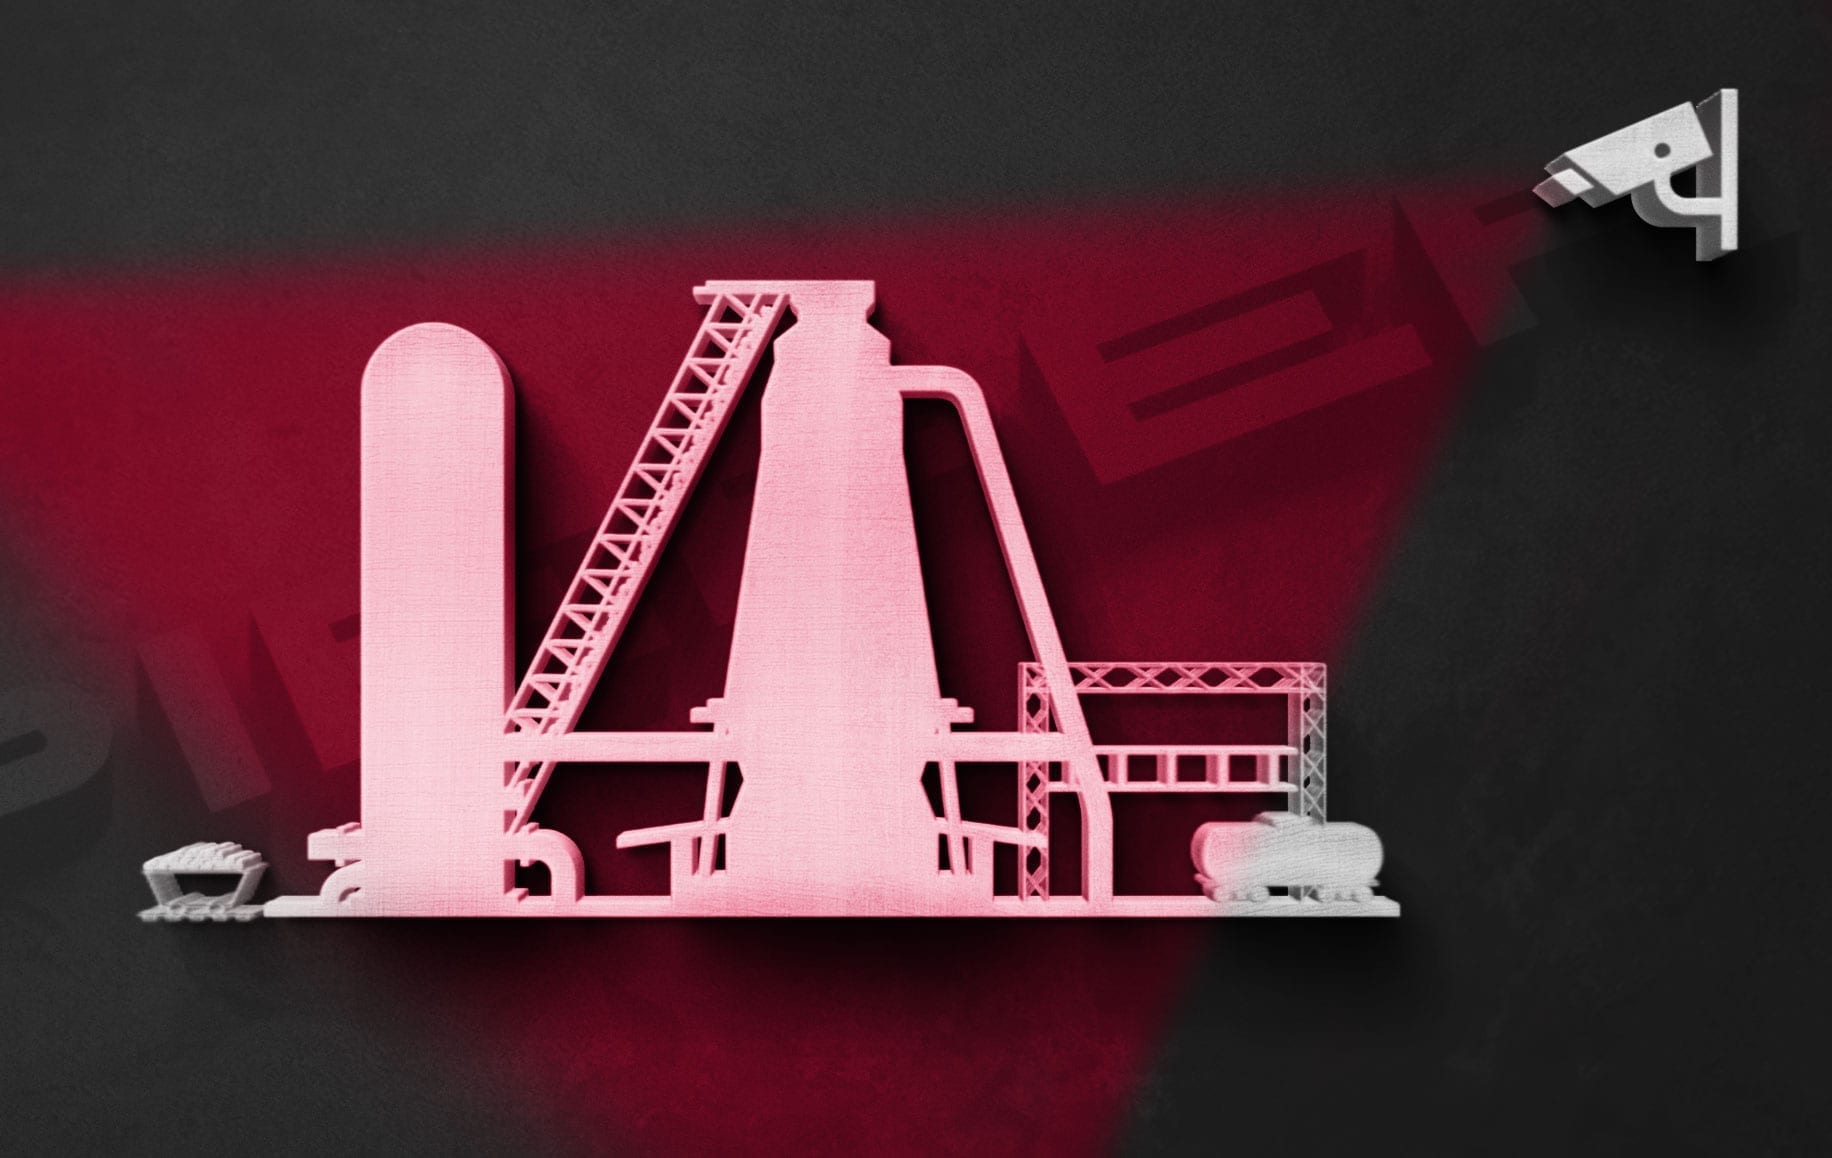 Blast furnace overview cameras Pieper